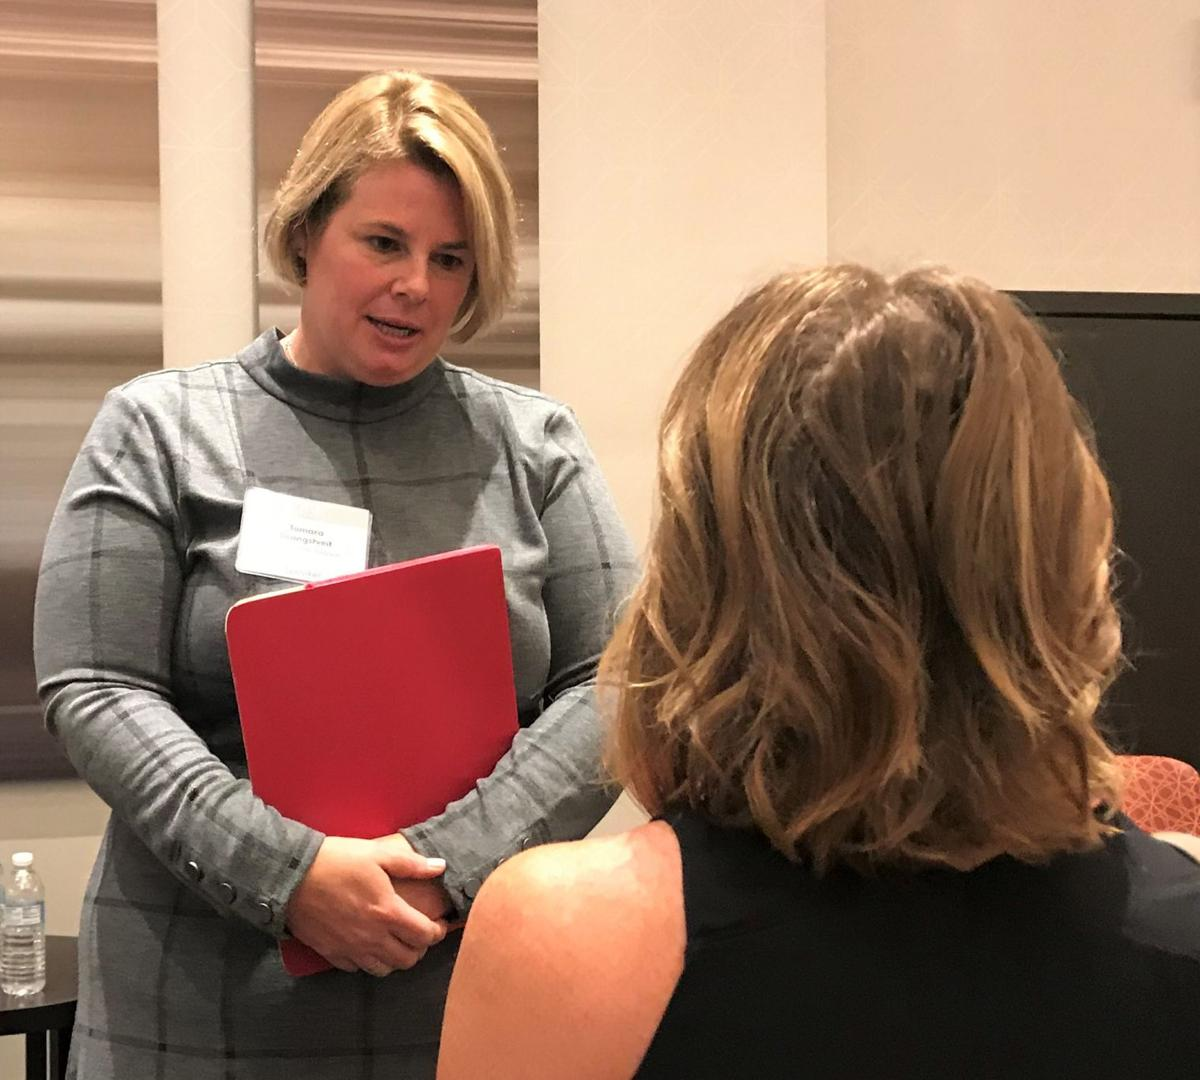 Tamara Pogue Drangstveit, CEO of Peak Health Alliance